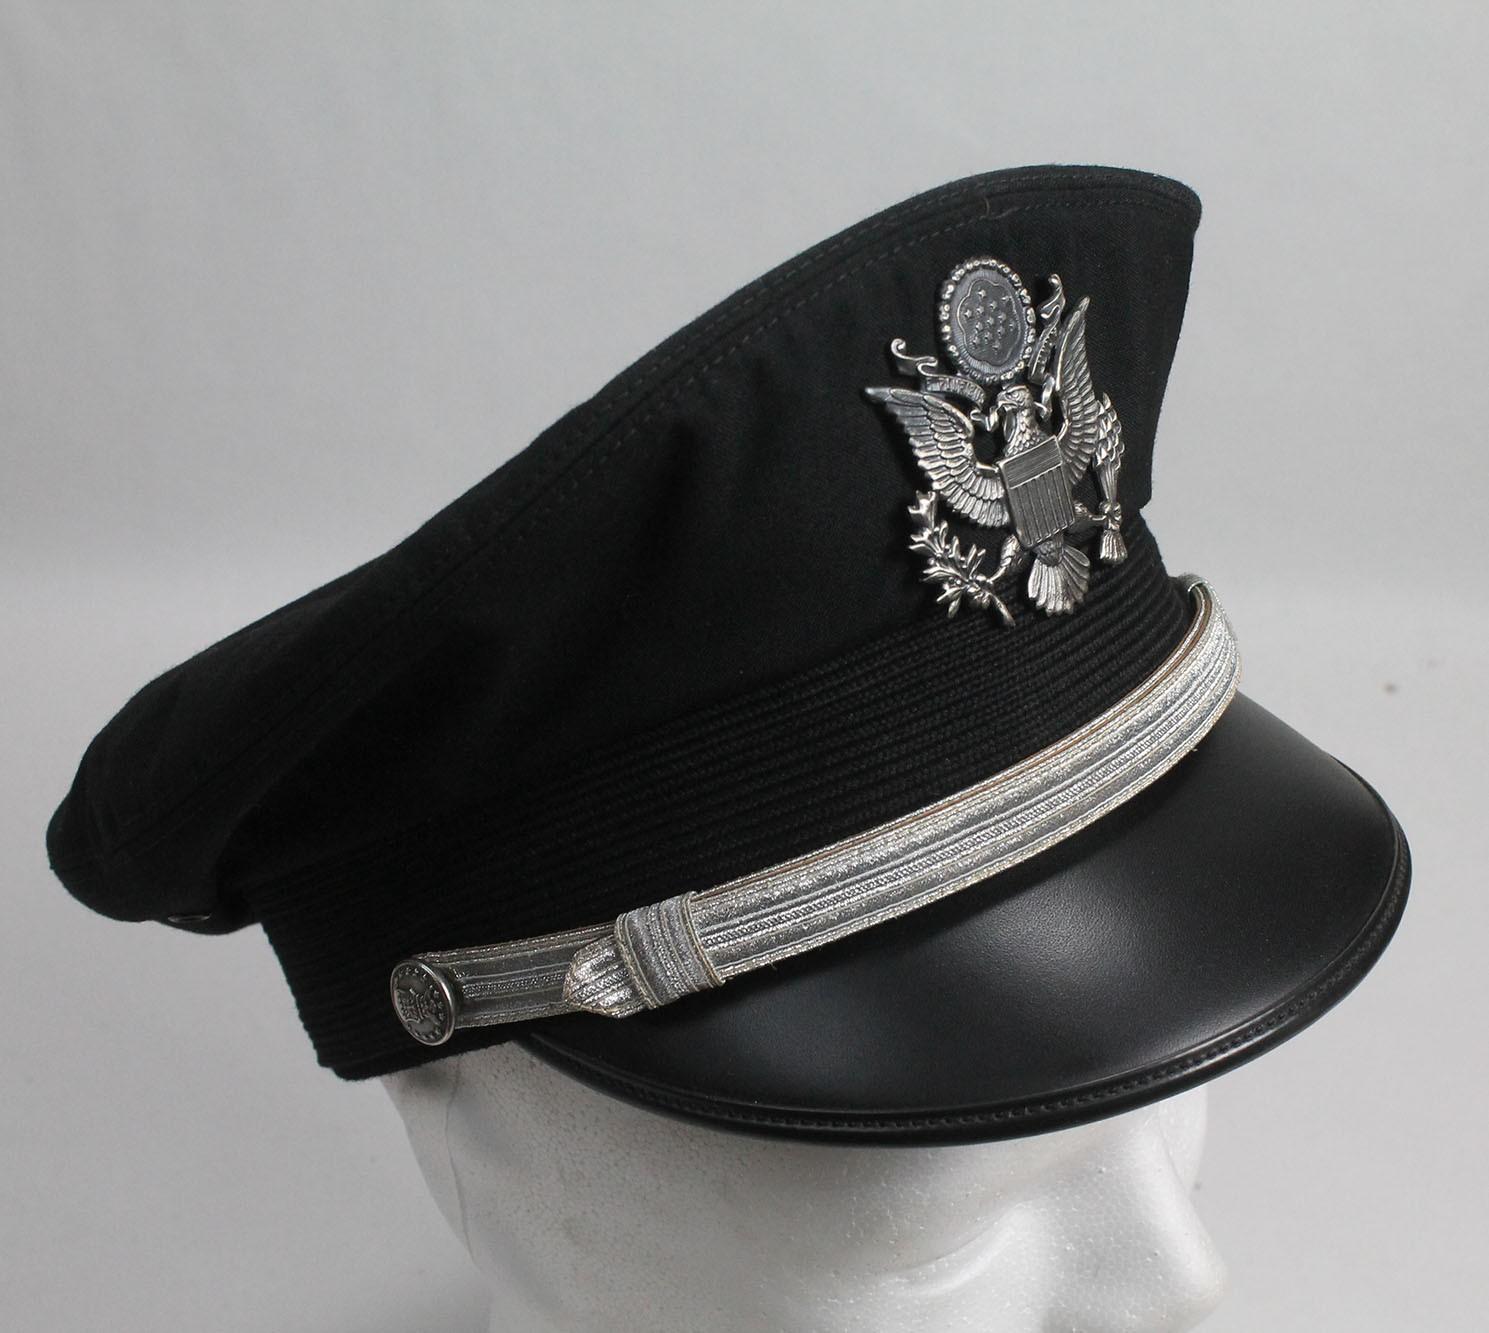 GU-WWII-NEGRA-2